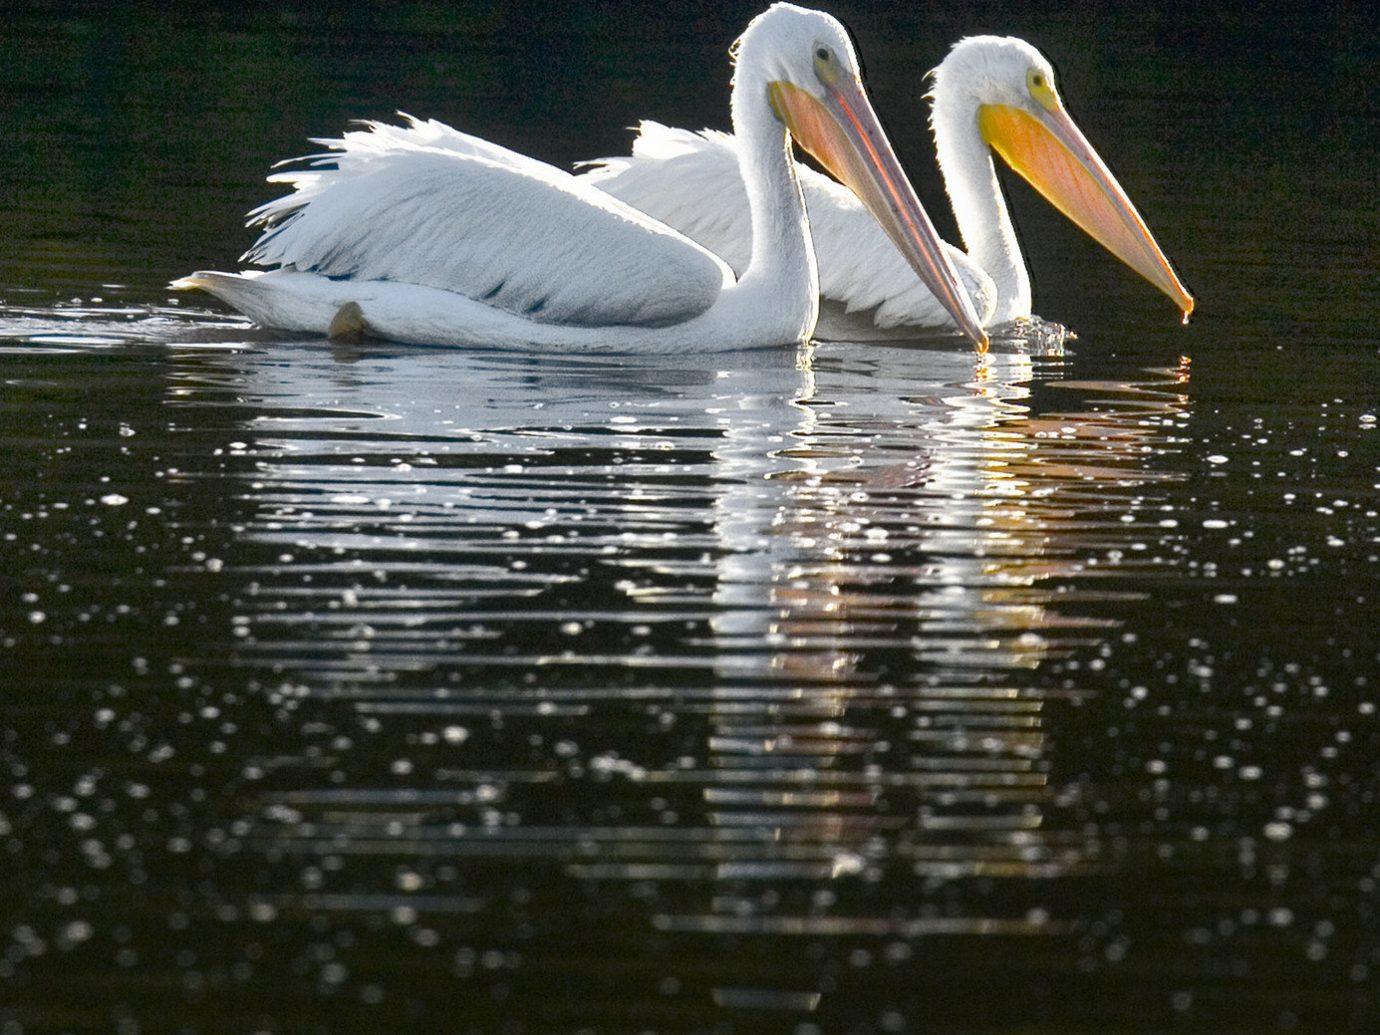 Hotels Secret Getaways Trip Ideas water outdoor Bird pelican animal vertebrate beak aquatic bird fauna seabird reflection Lake pelecaniformes wing pond